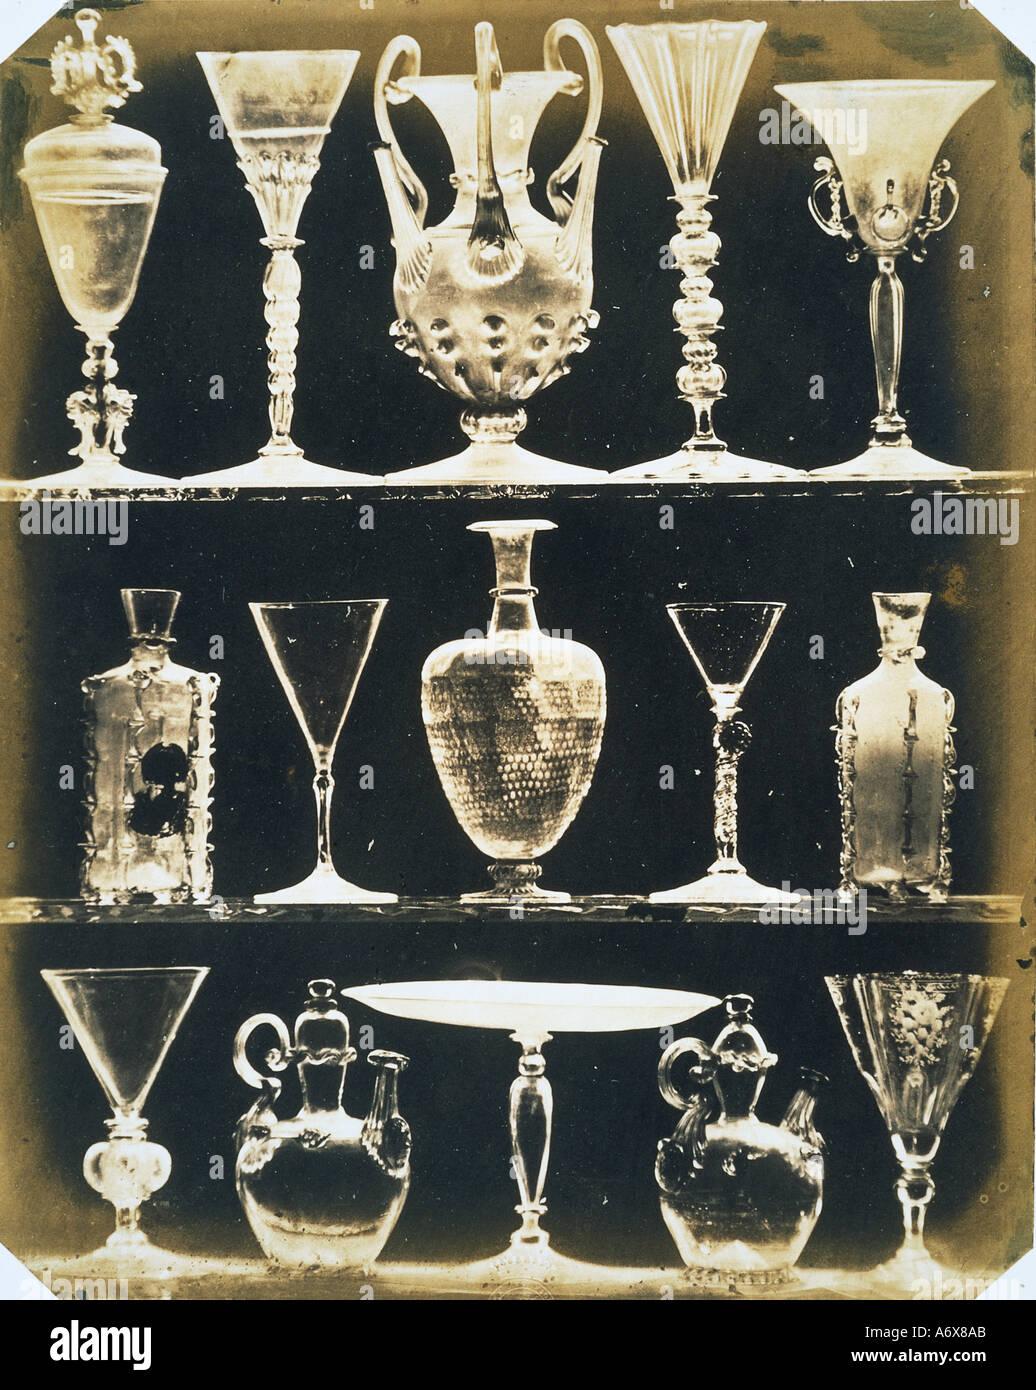 Venetian Vases and Glasses. Photo by Ludwig Belitski. Venice, Italy, 1855. - Stock Image